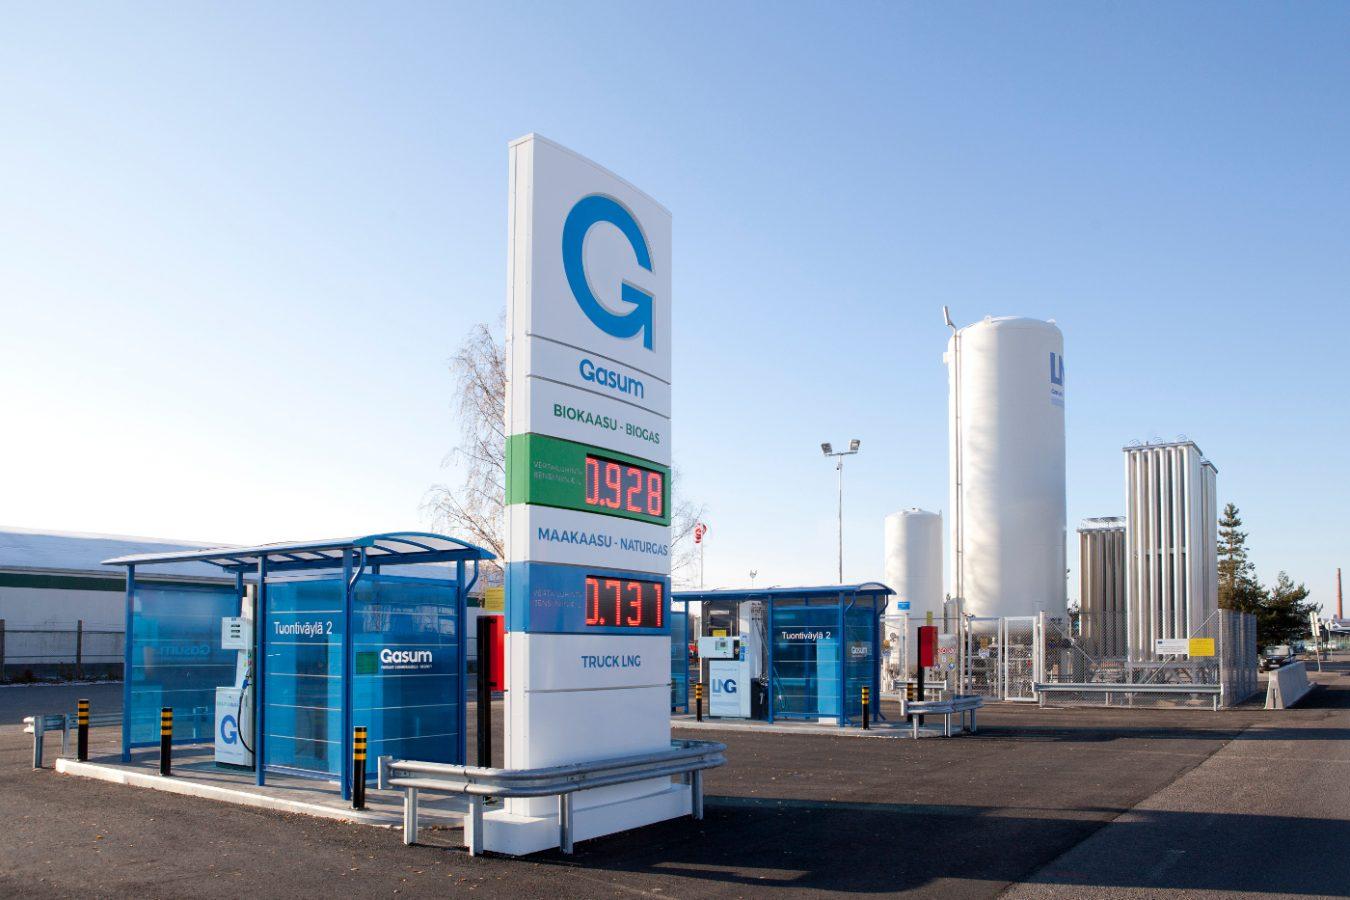 IKEA foodwaste gets a new life as pure Gasum biogas